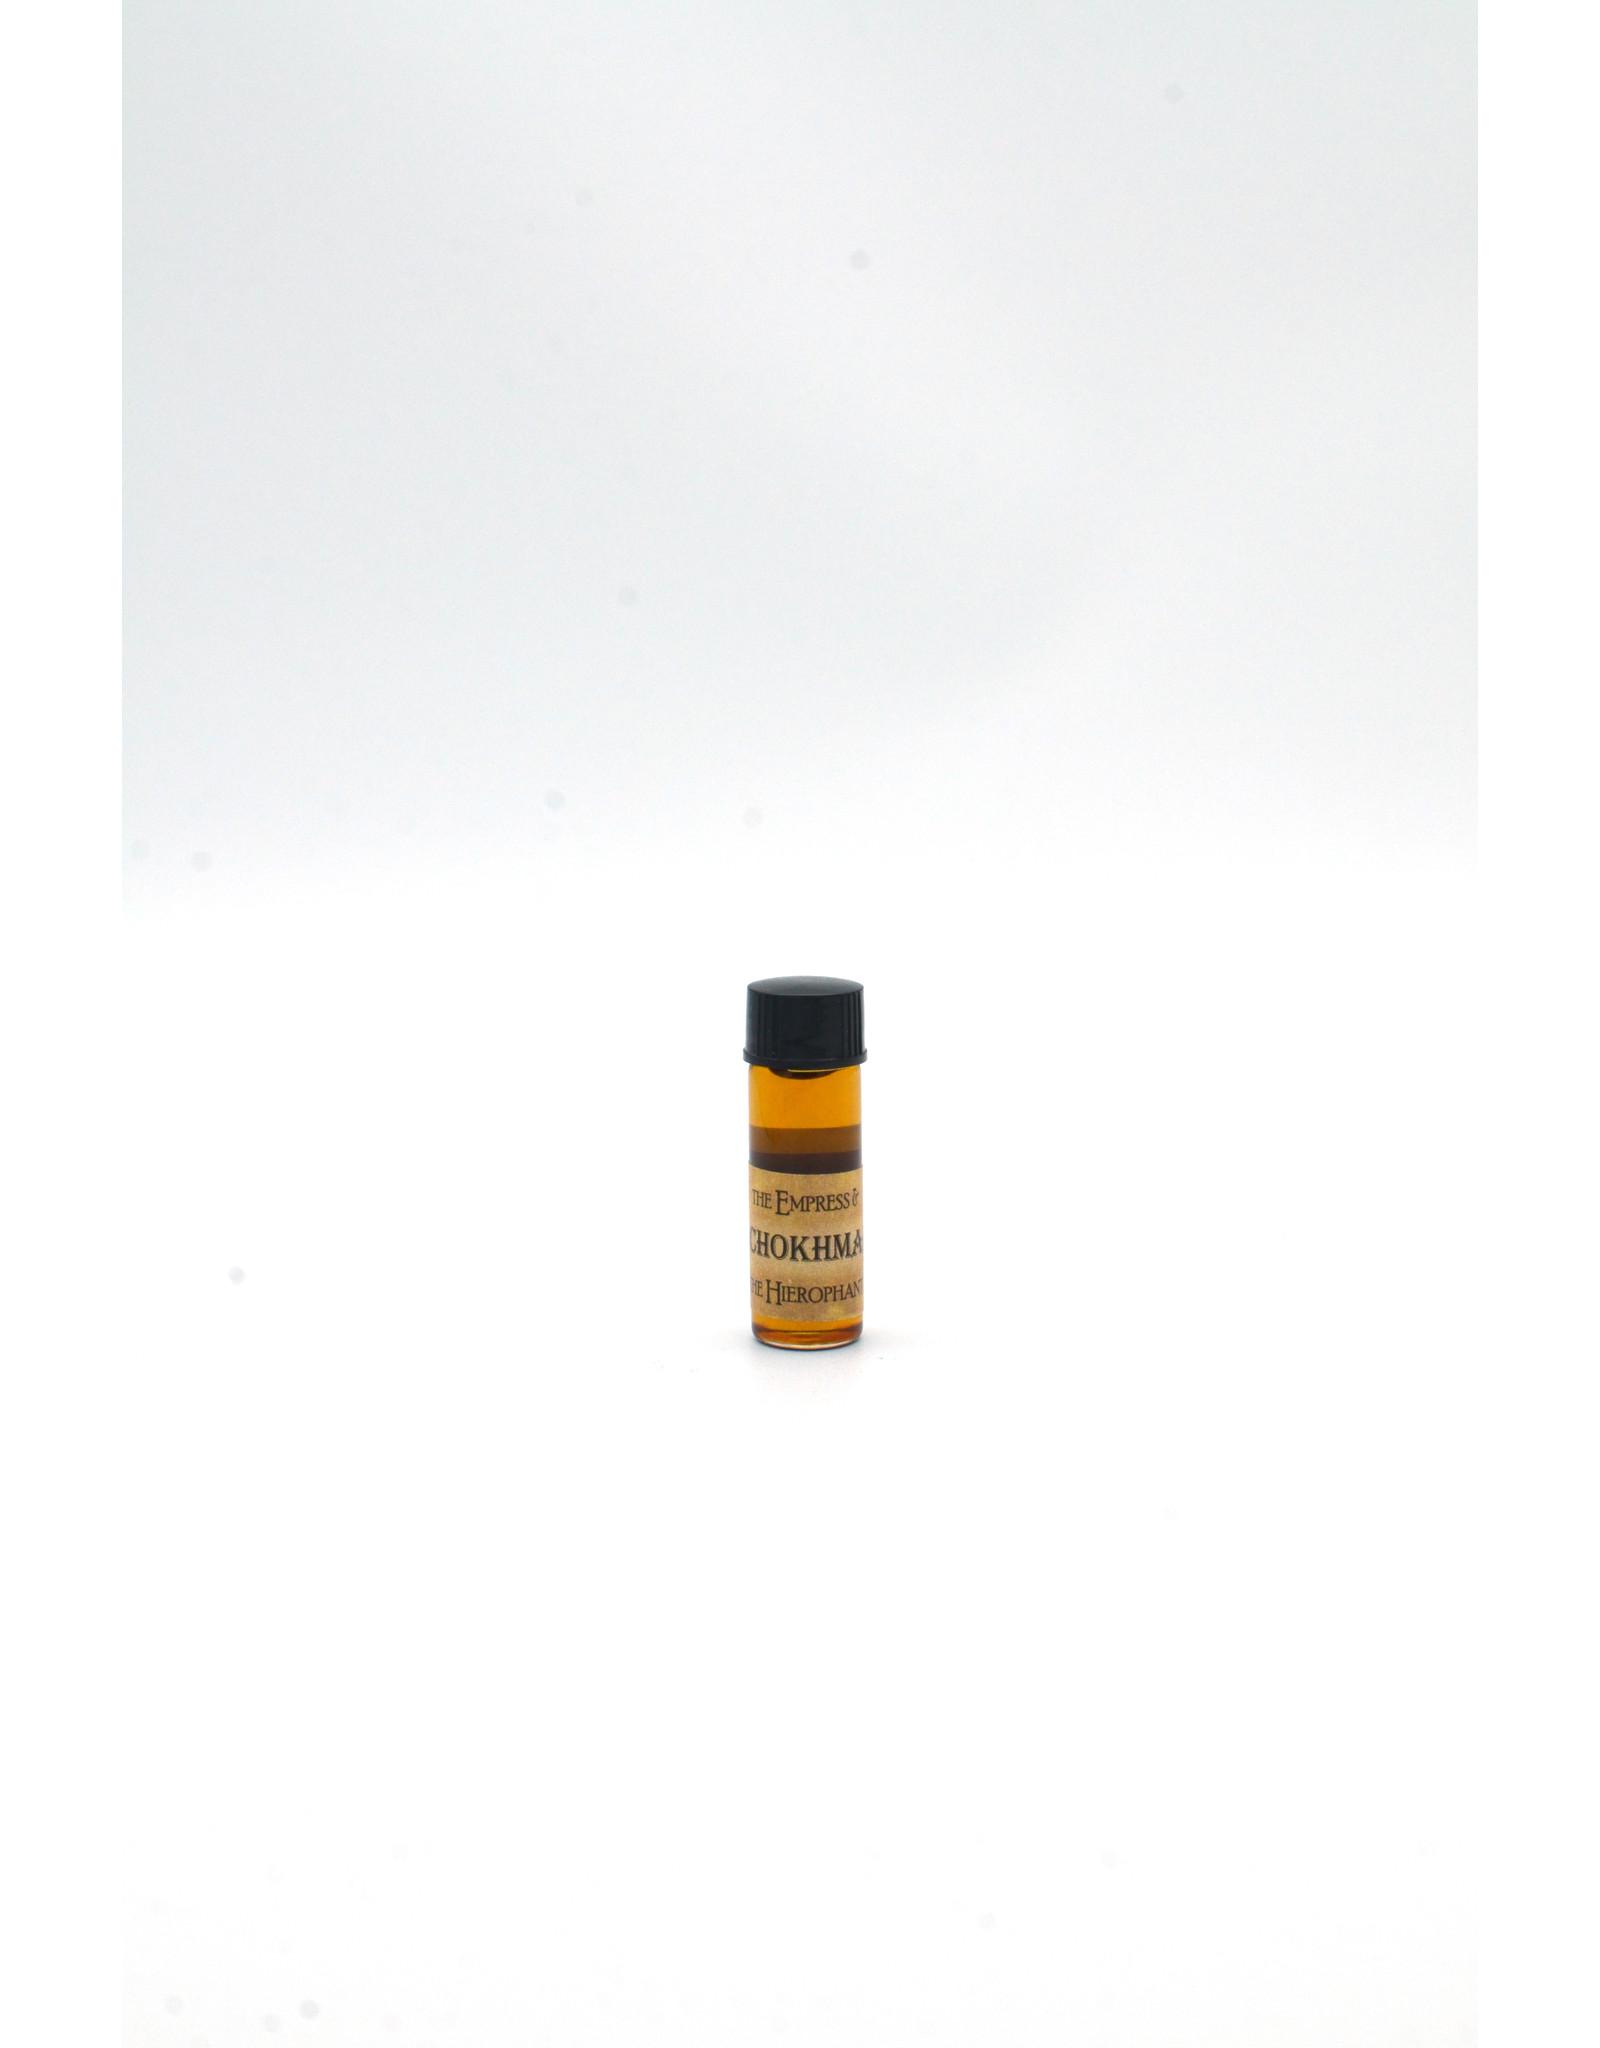 Chokhmah Magickal Oil 1 Dram Bottle